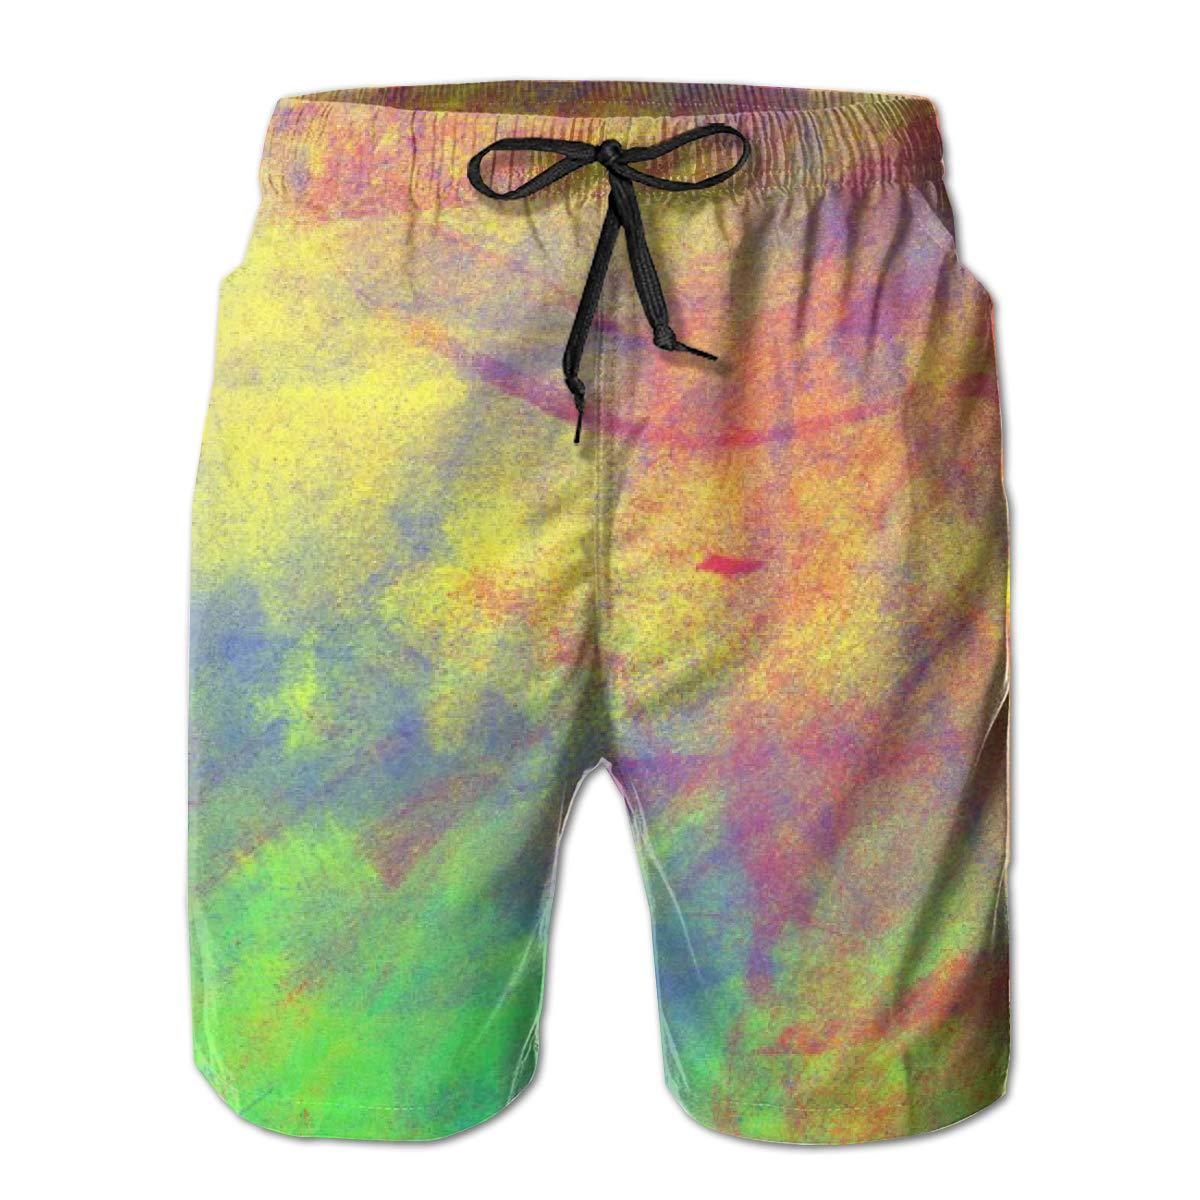 Tie Dye Vintage Pigment Mens Summer Casual Shorts,Beach Shorts Board Shorts